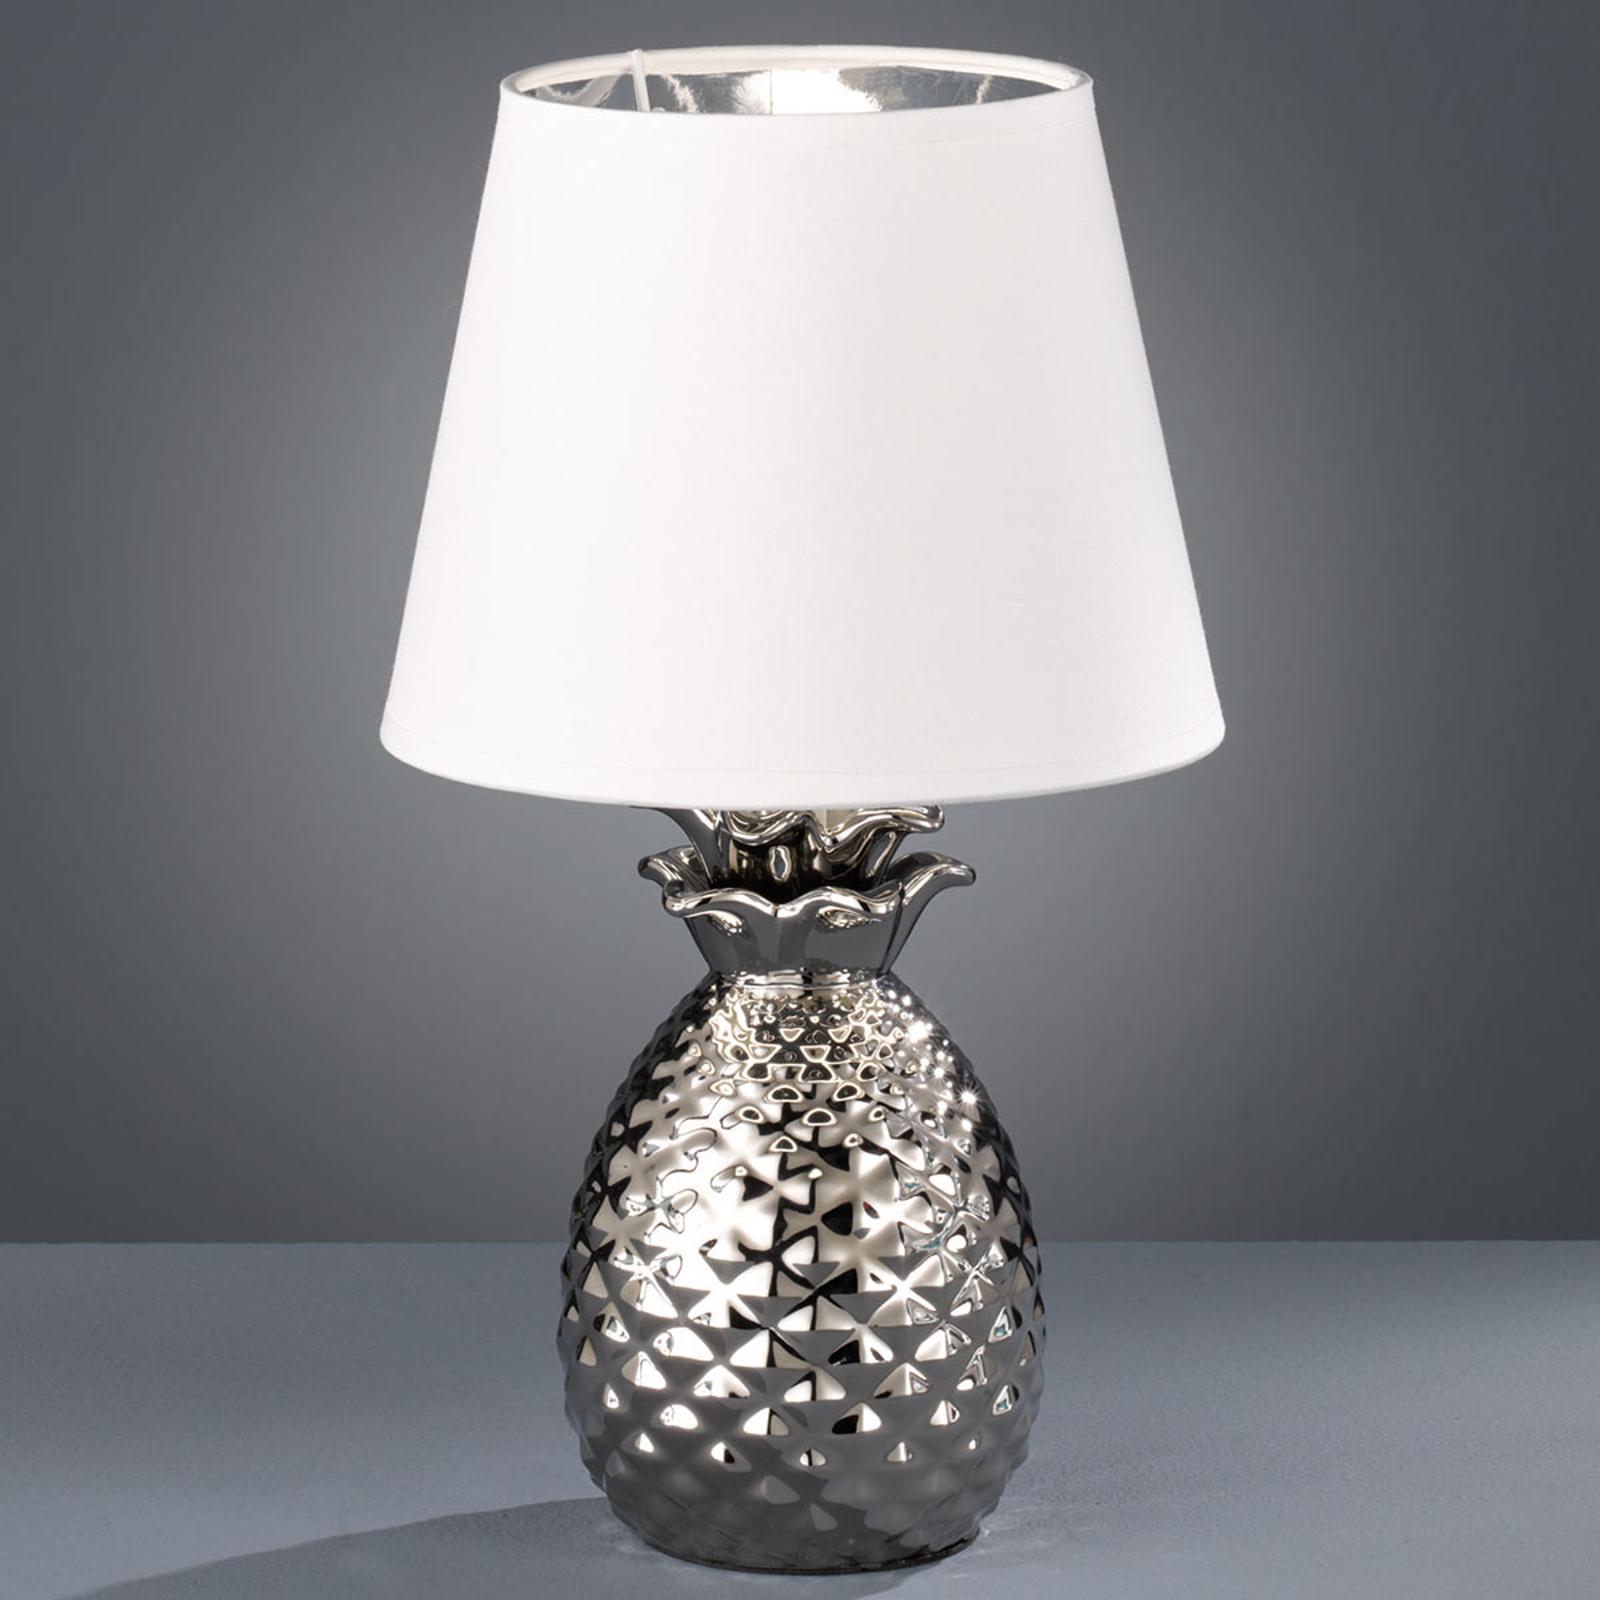 Dekorative Keramik-Tischlampe Pineapple, silber